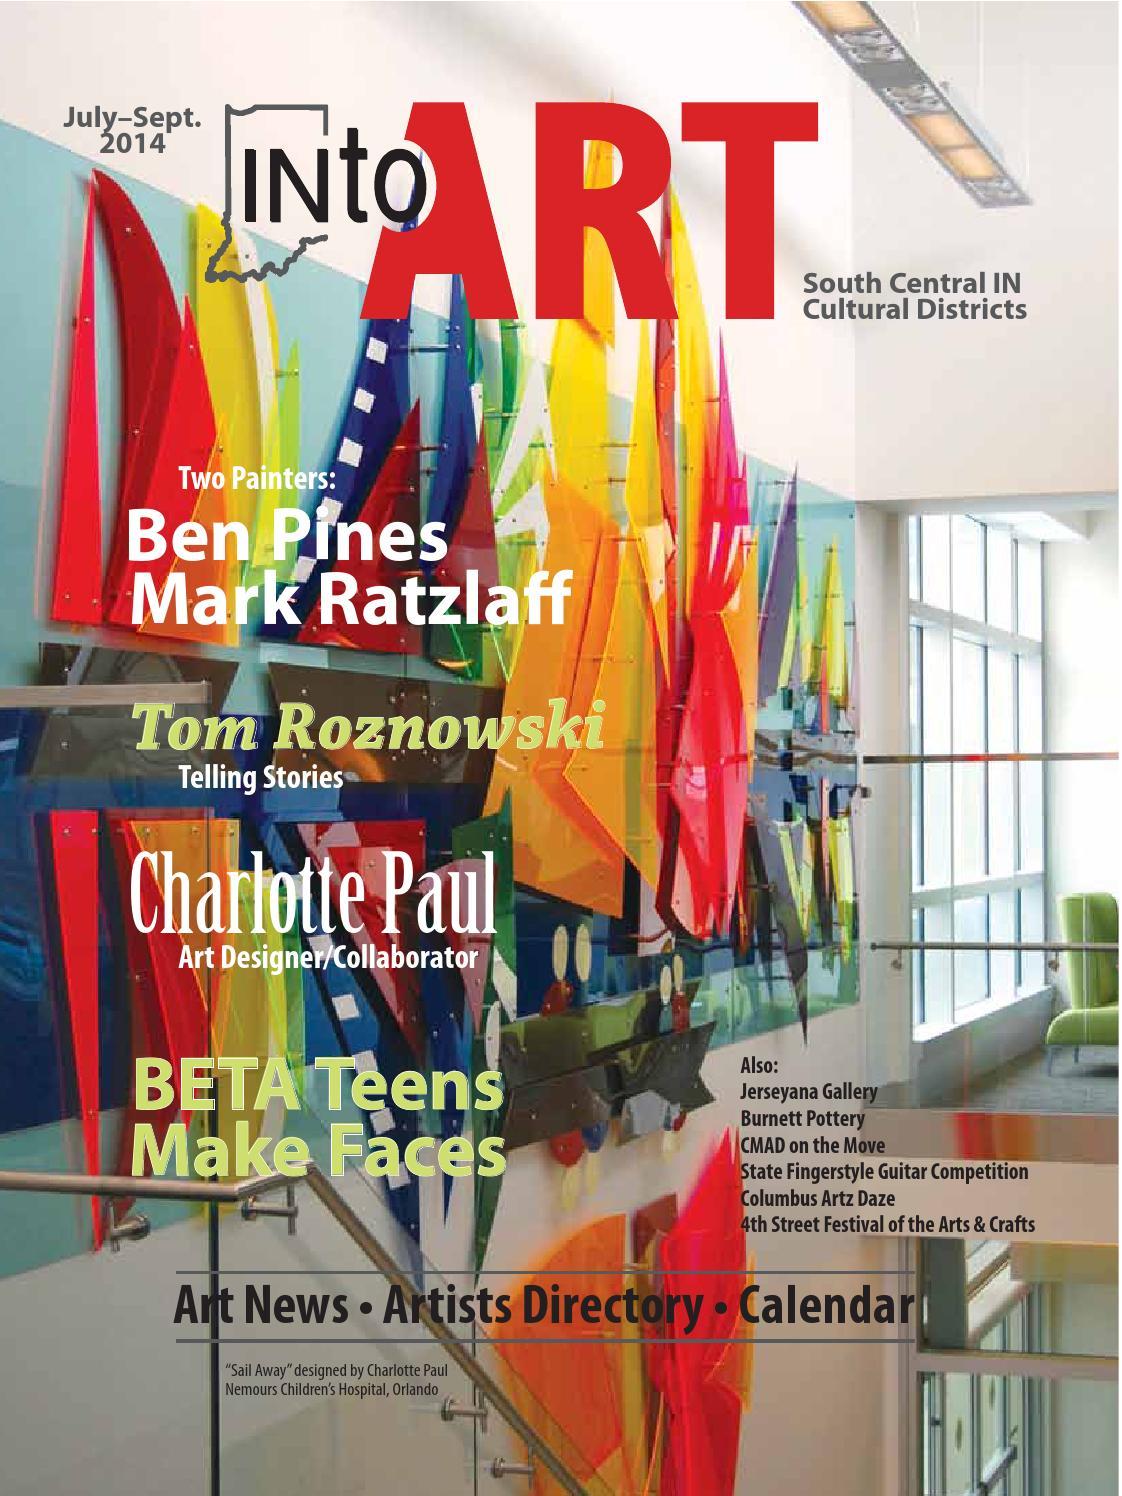 July-Sept  2014 INTO ART Magazine by INto Art magazine - issuu